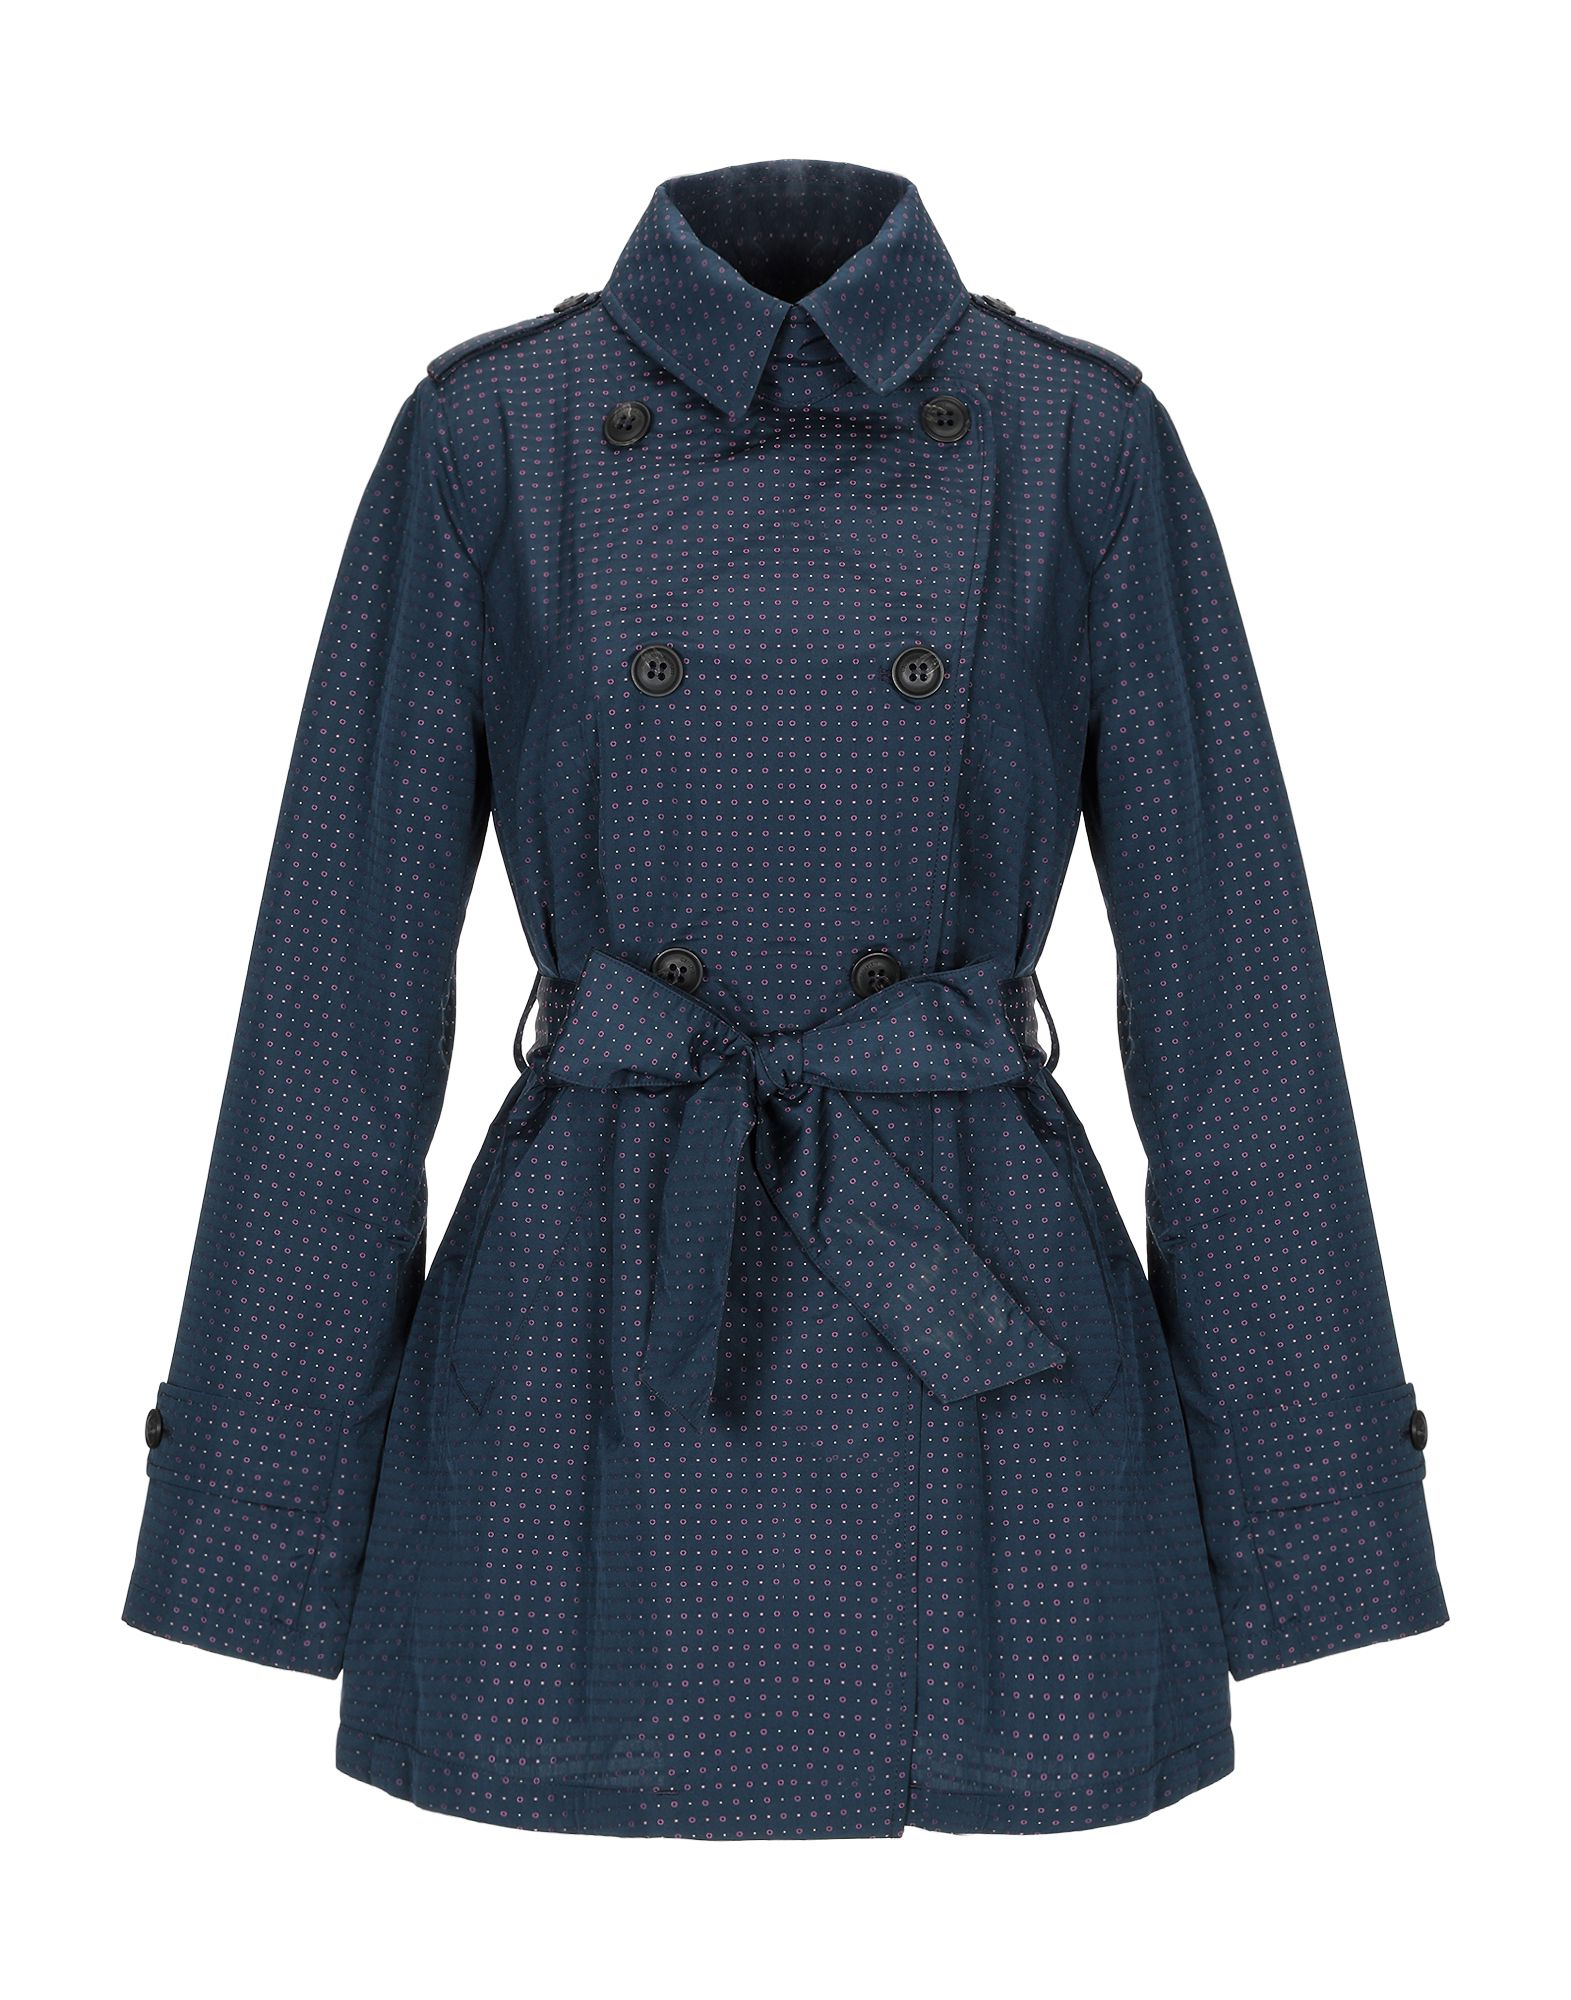 GEOSPIRIT Overcoats in Dark Blue